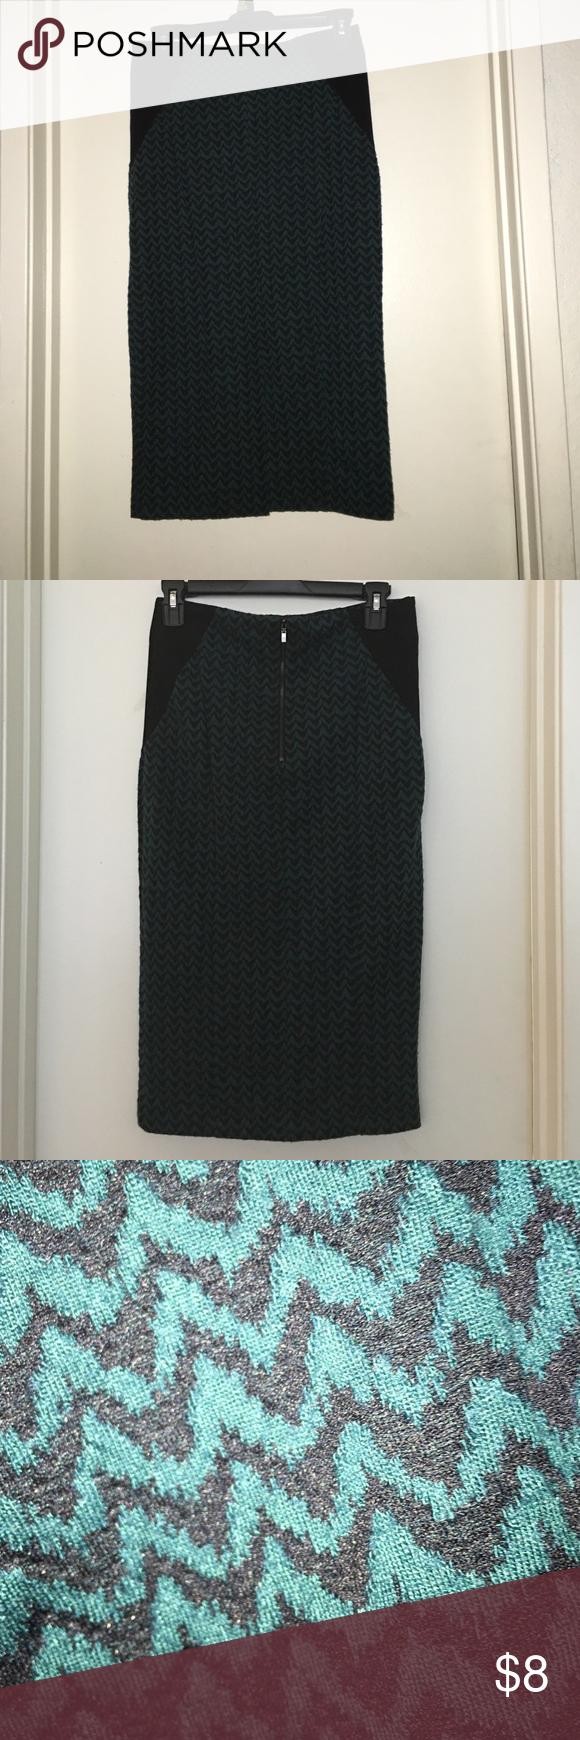 Pencil skirt Teal/black pencil skirt with slit Skirts Pencil